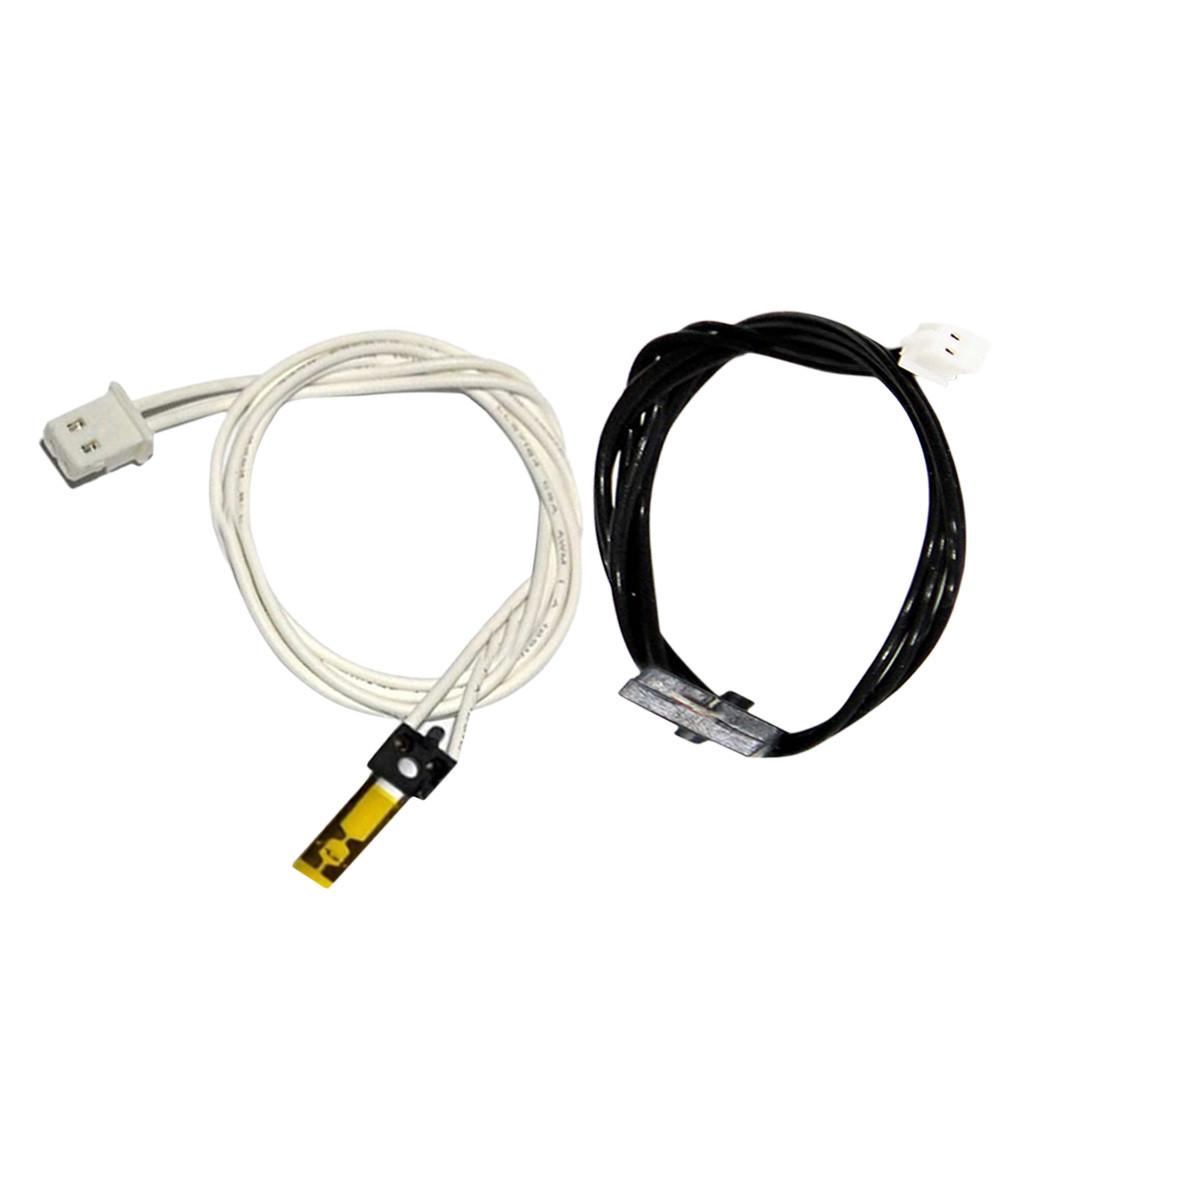 Par Thermistor Brother HL-5240 5250DN DCP-8060 DCP-8085 DCP-8065DN MFC-8460N | LJ1345002 LJ1345001